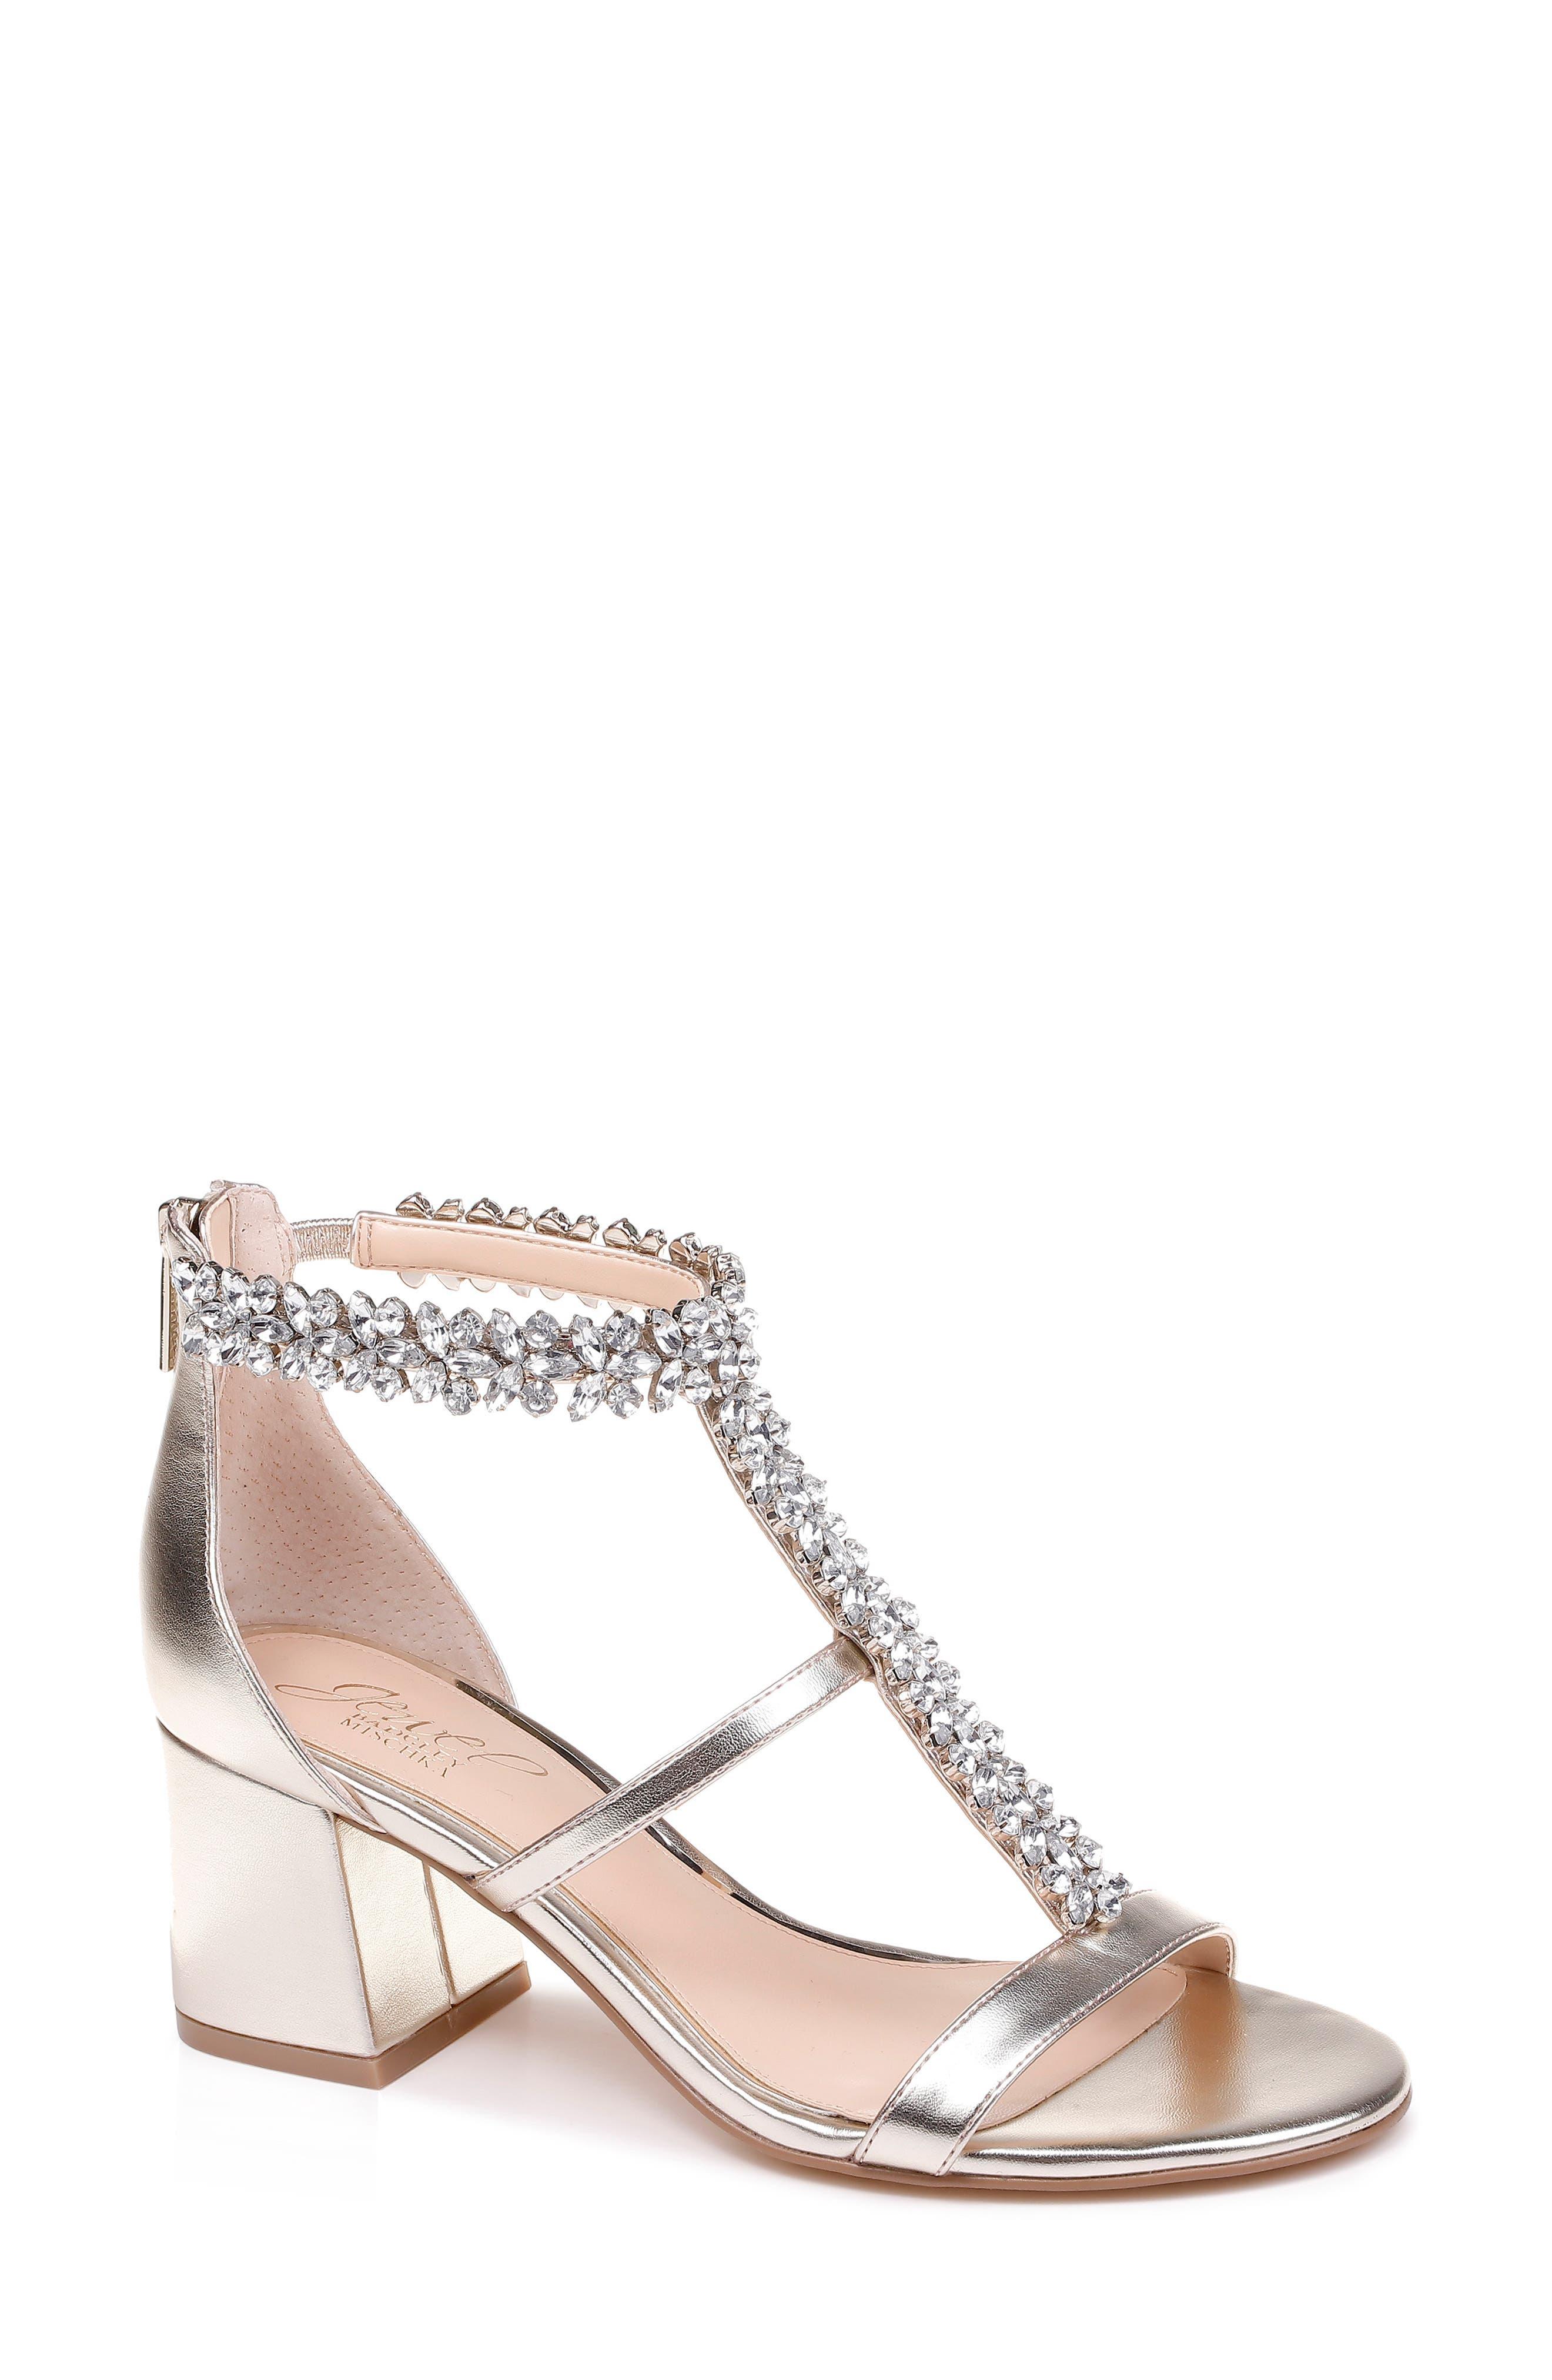 JEWEL BADGLEY MISCHKA Janica Block Heel Sandal, Main, color, LIGHT GOLD SATIN